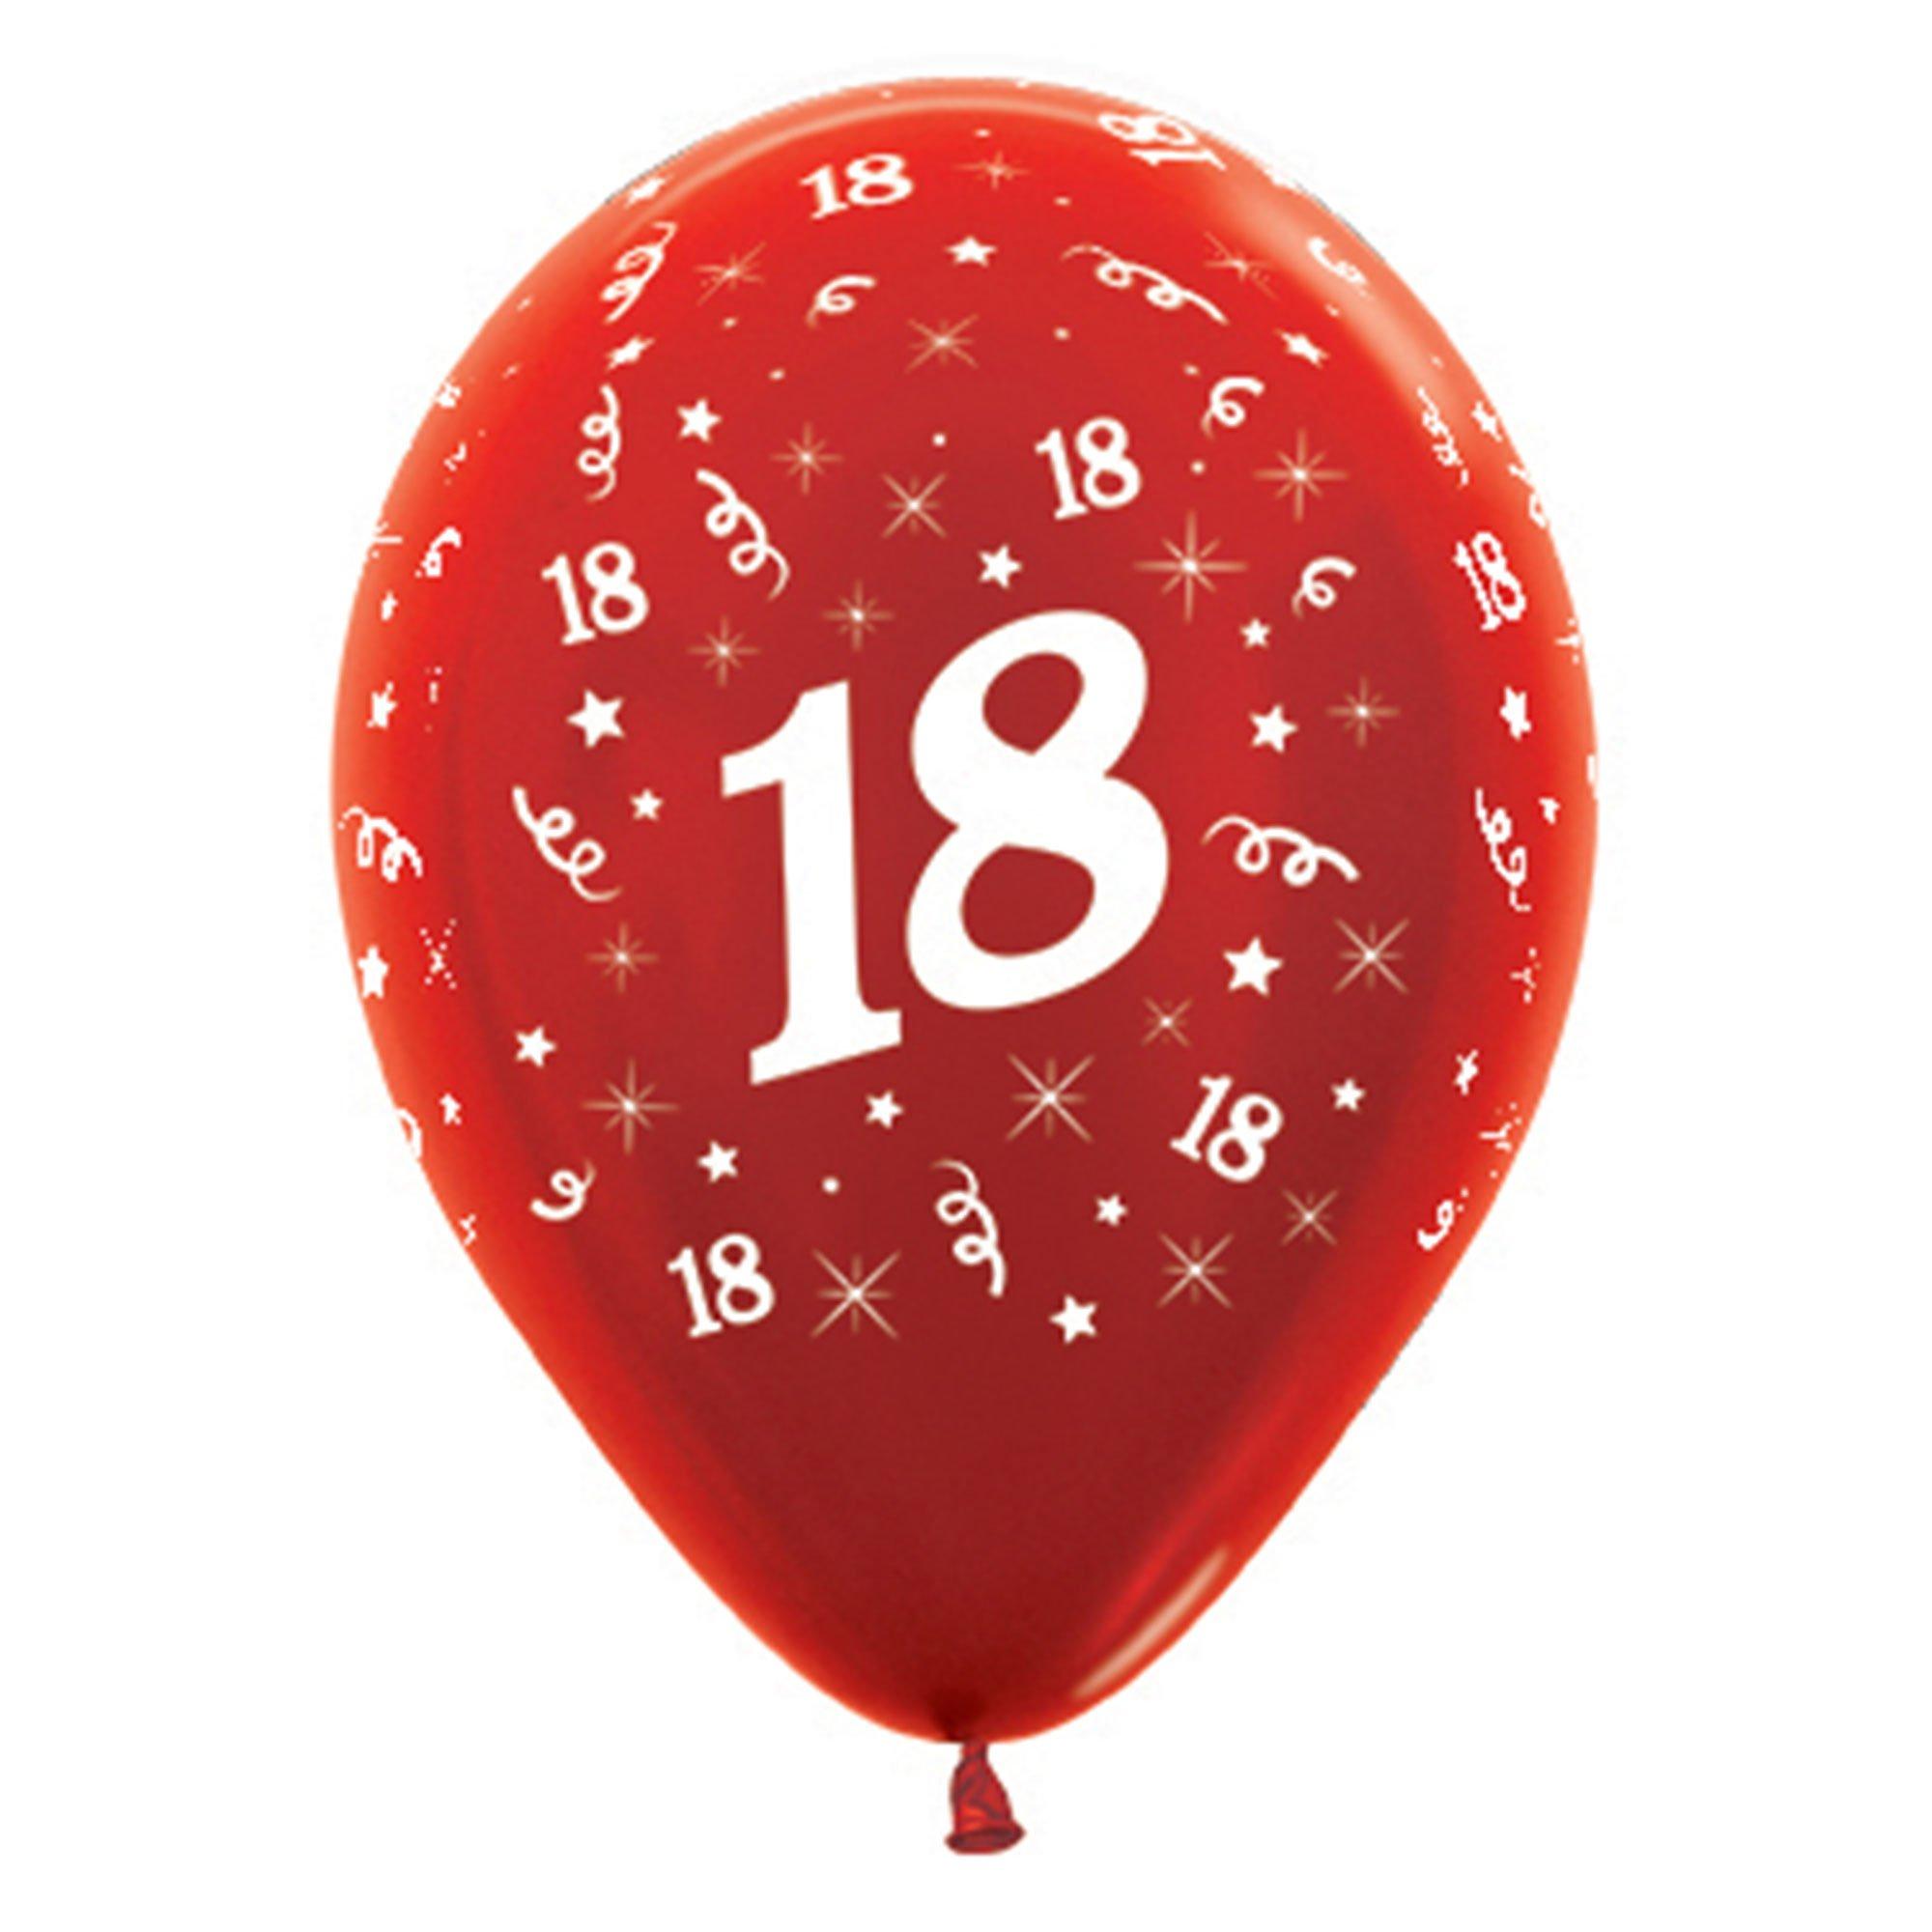 Sempertex 30cm Age 18 Metallic Red Latex Balloons, 25PK